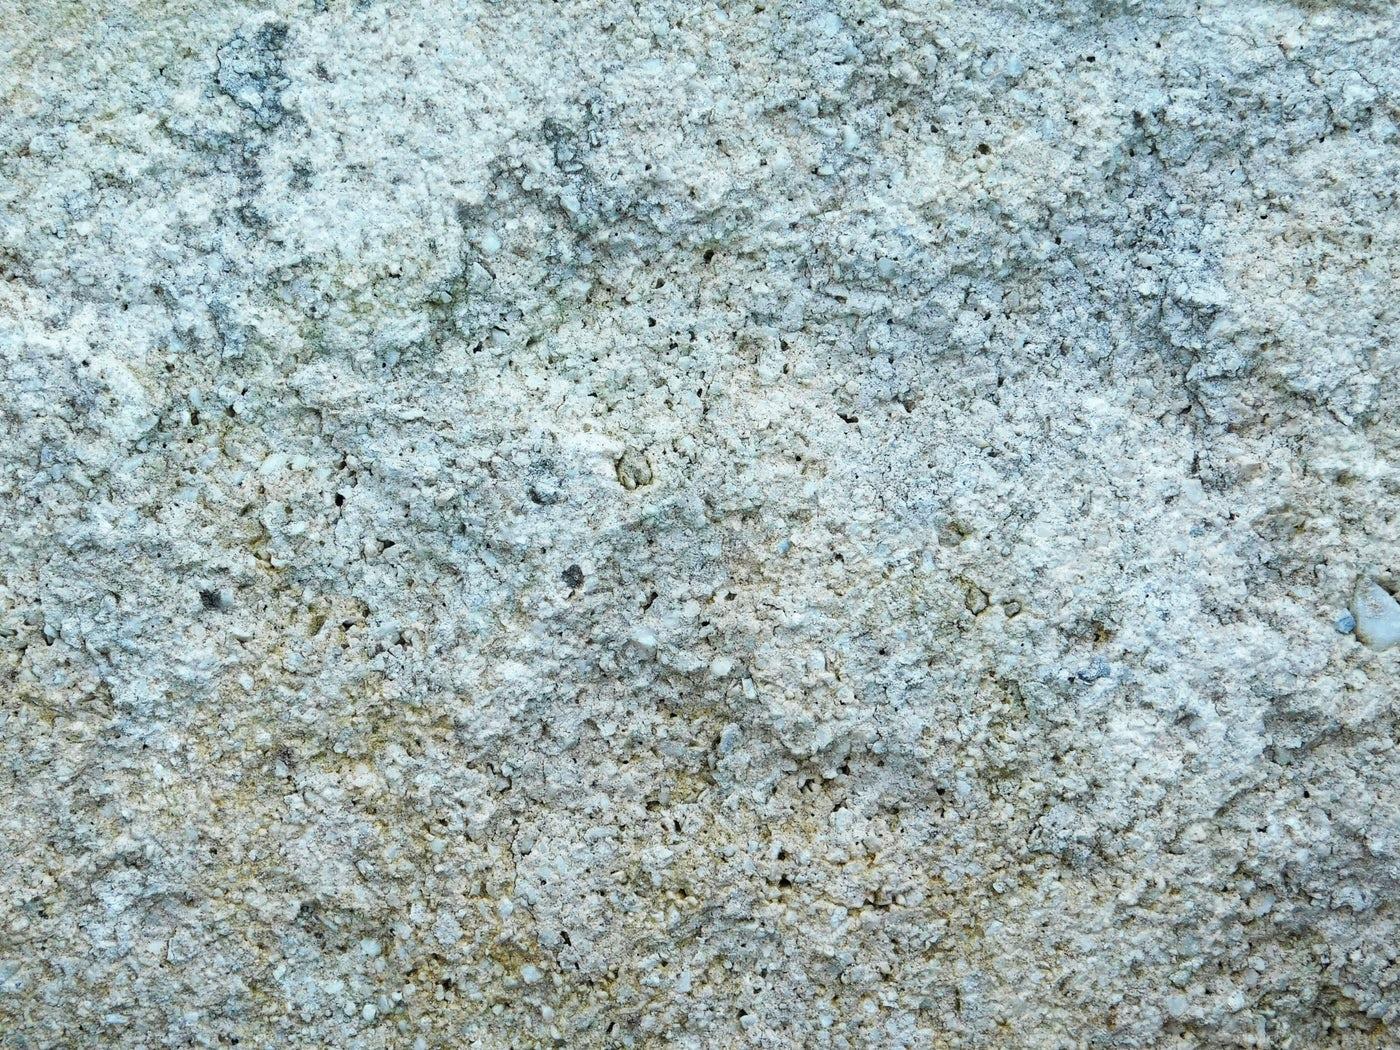 Lumpy Stone Texture: Stock Photos